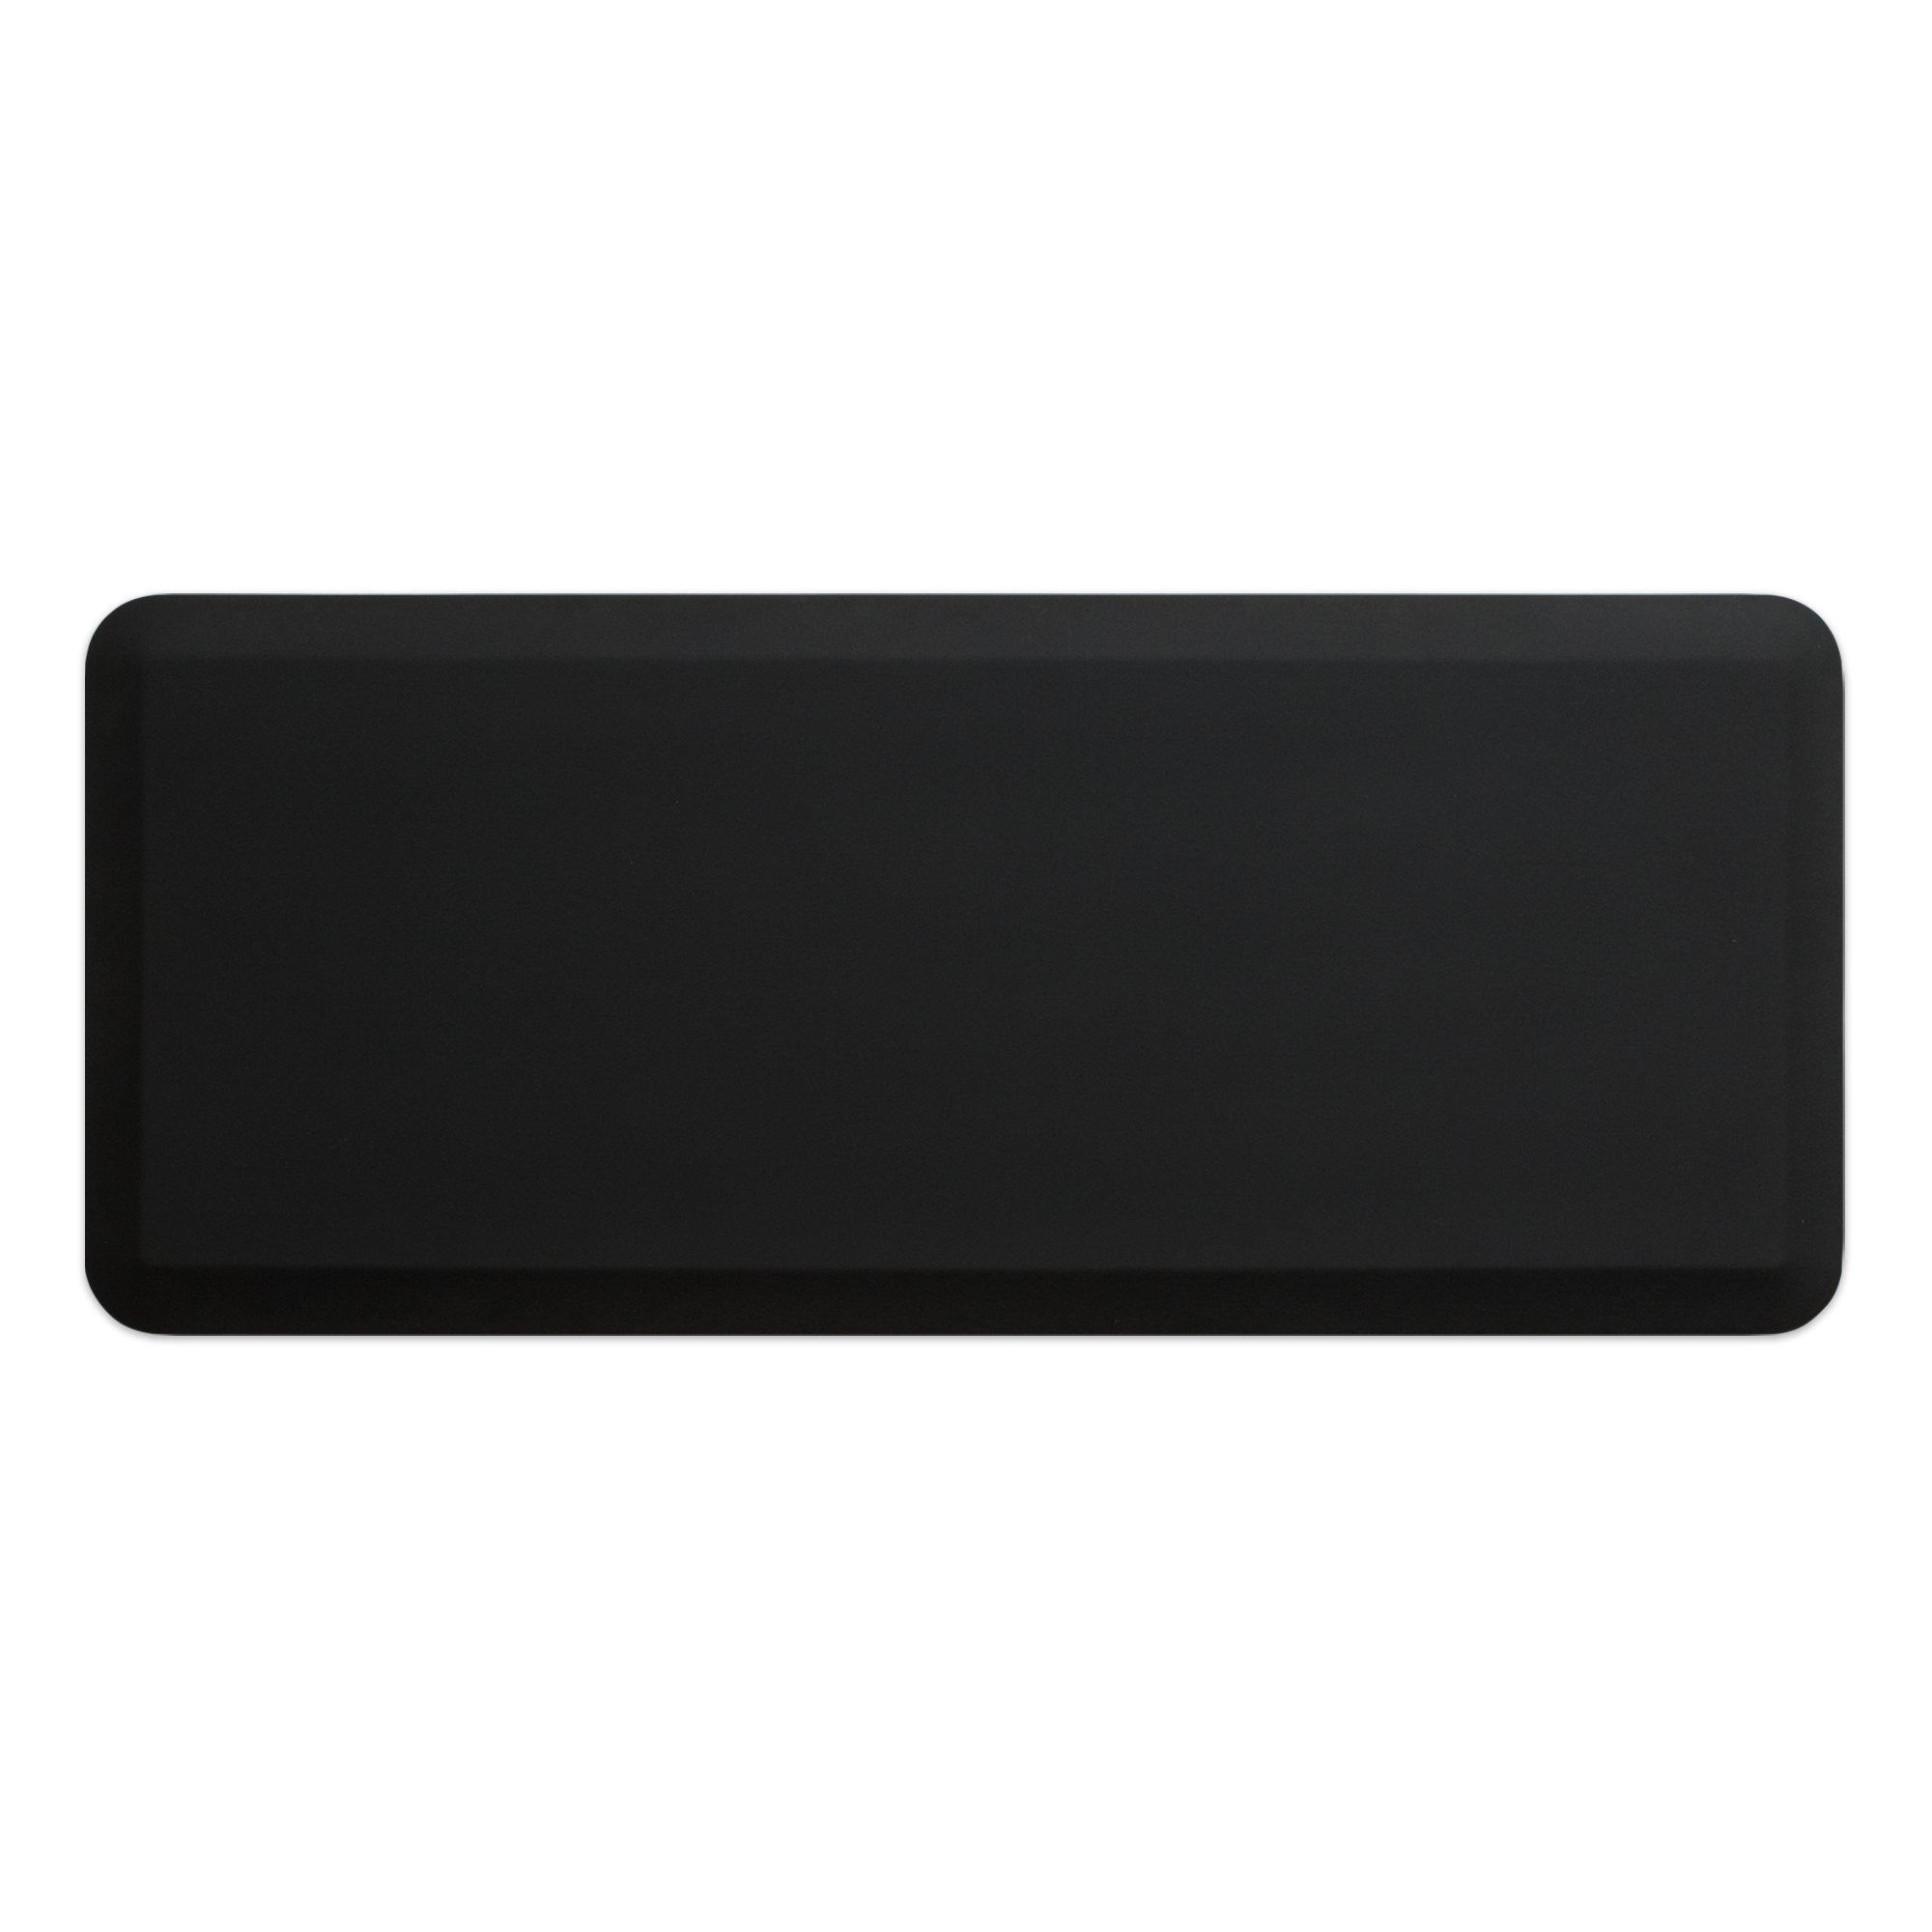 NewLife by GelPro Professional Grade Anti-Fatigue Kitchen & Office Comfort Mat, 20x48, Midnight ¾'' Bio-Foam Mat with non-slip bottom for health & wellness